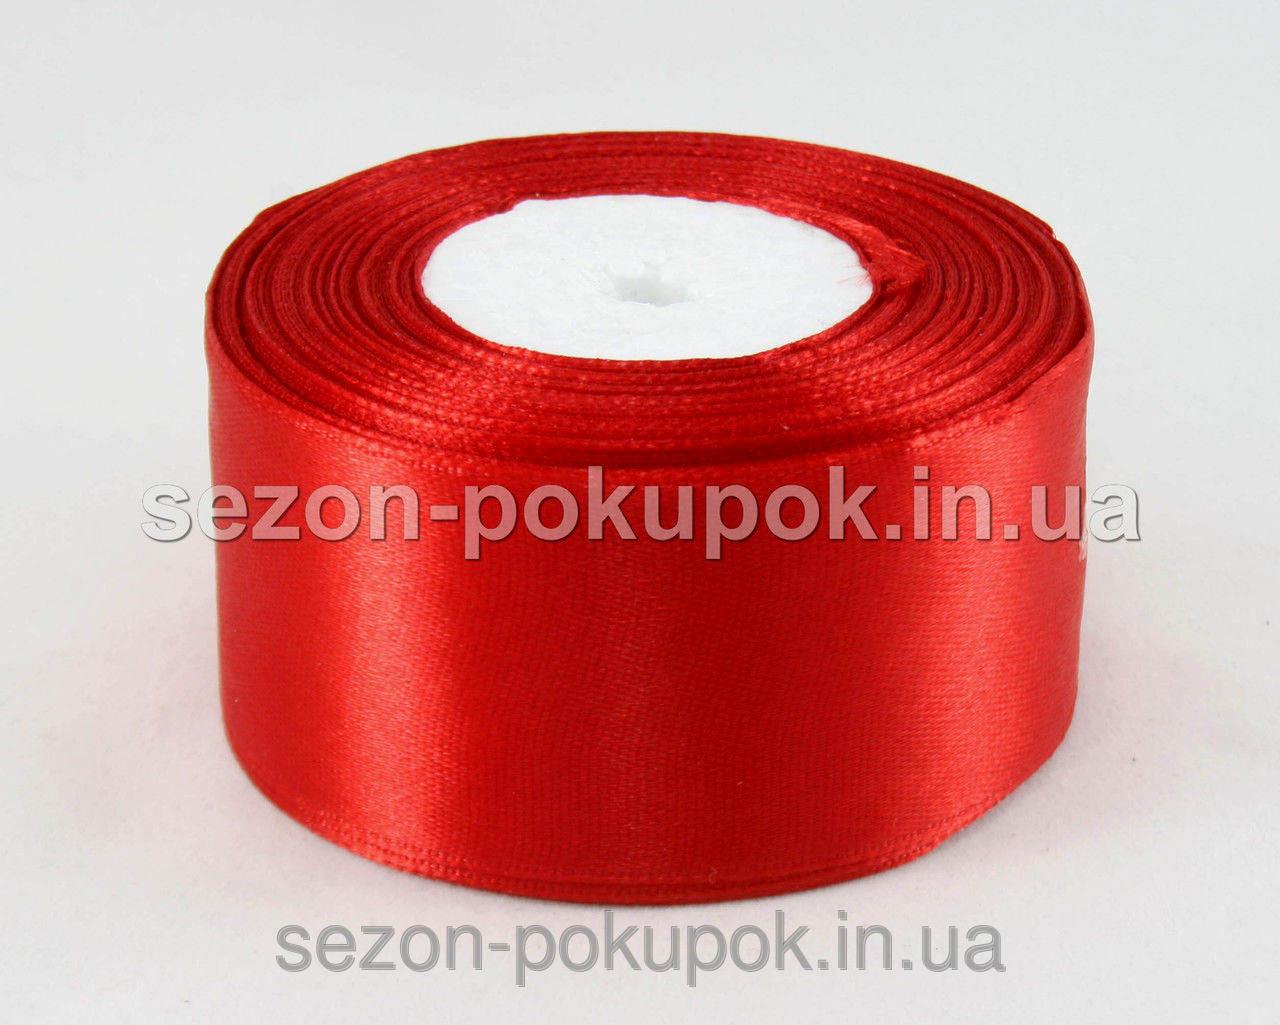 Лента атласная ширина 4 см (23 метра) цвет - красный